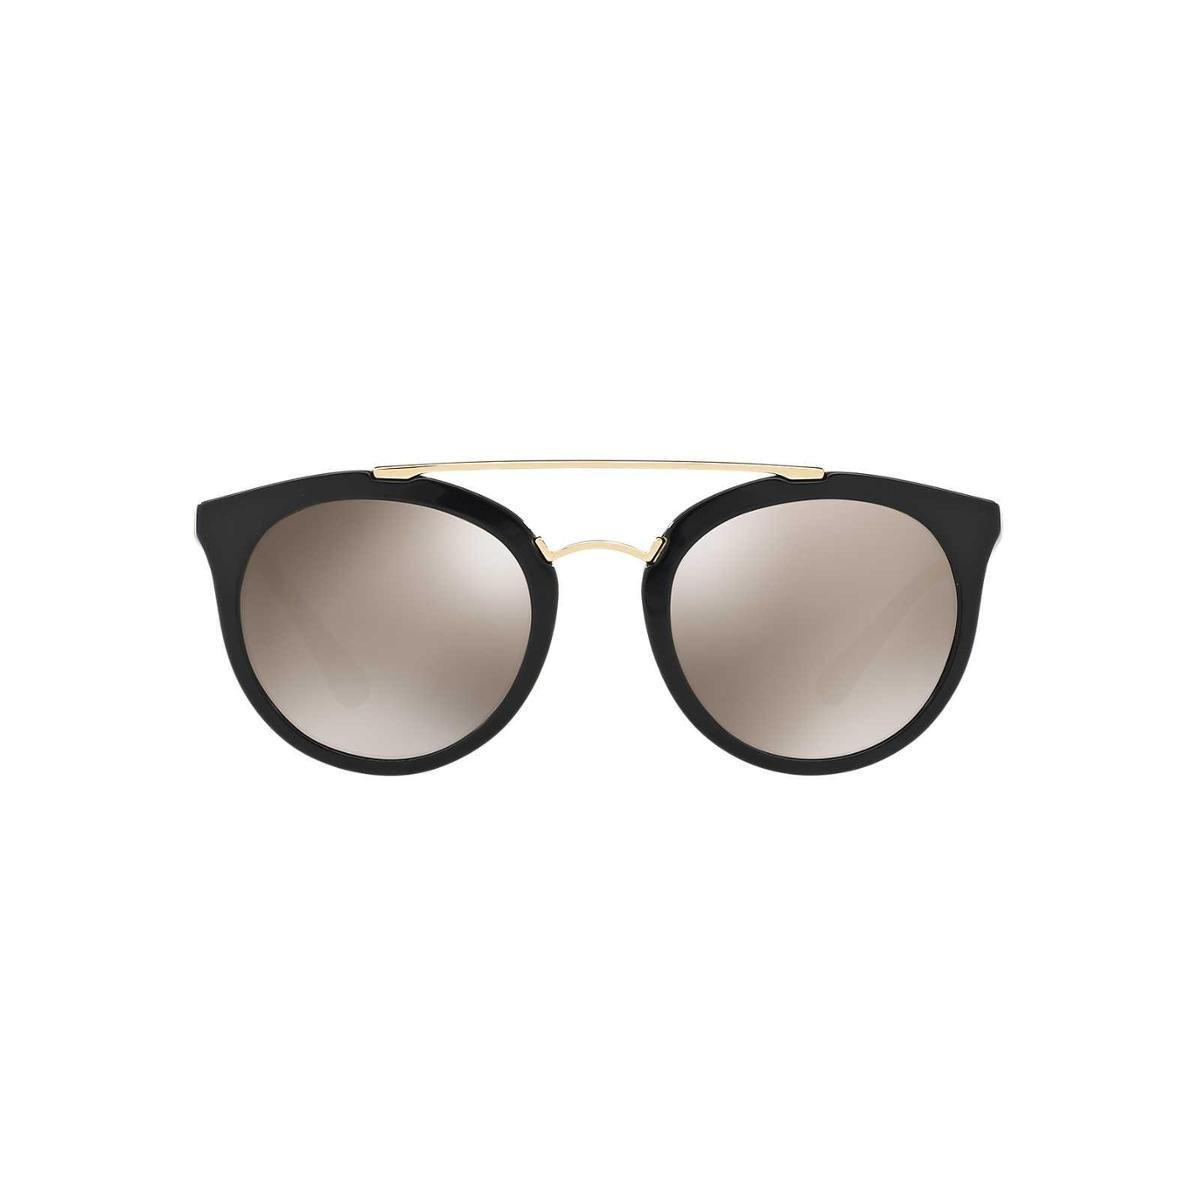 4d23c17d26180 Óculos de Sol Armani Exchange Redondo - Compre Agora   Zattini